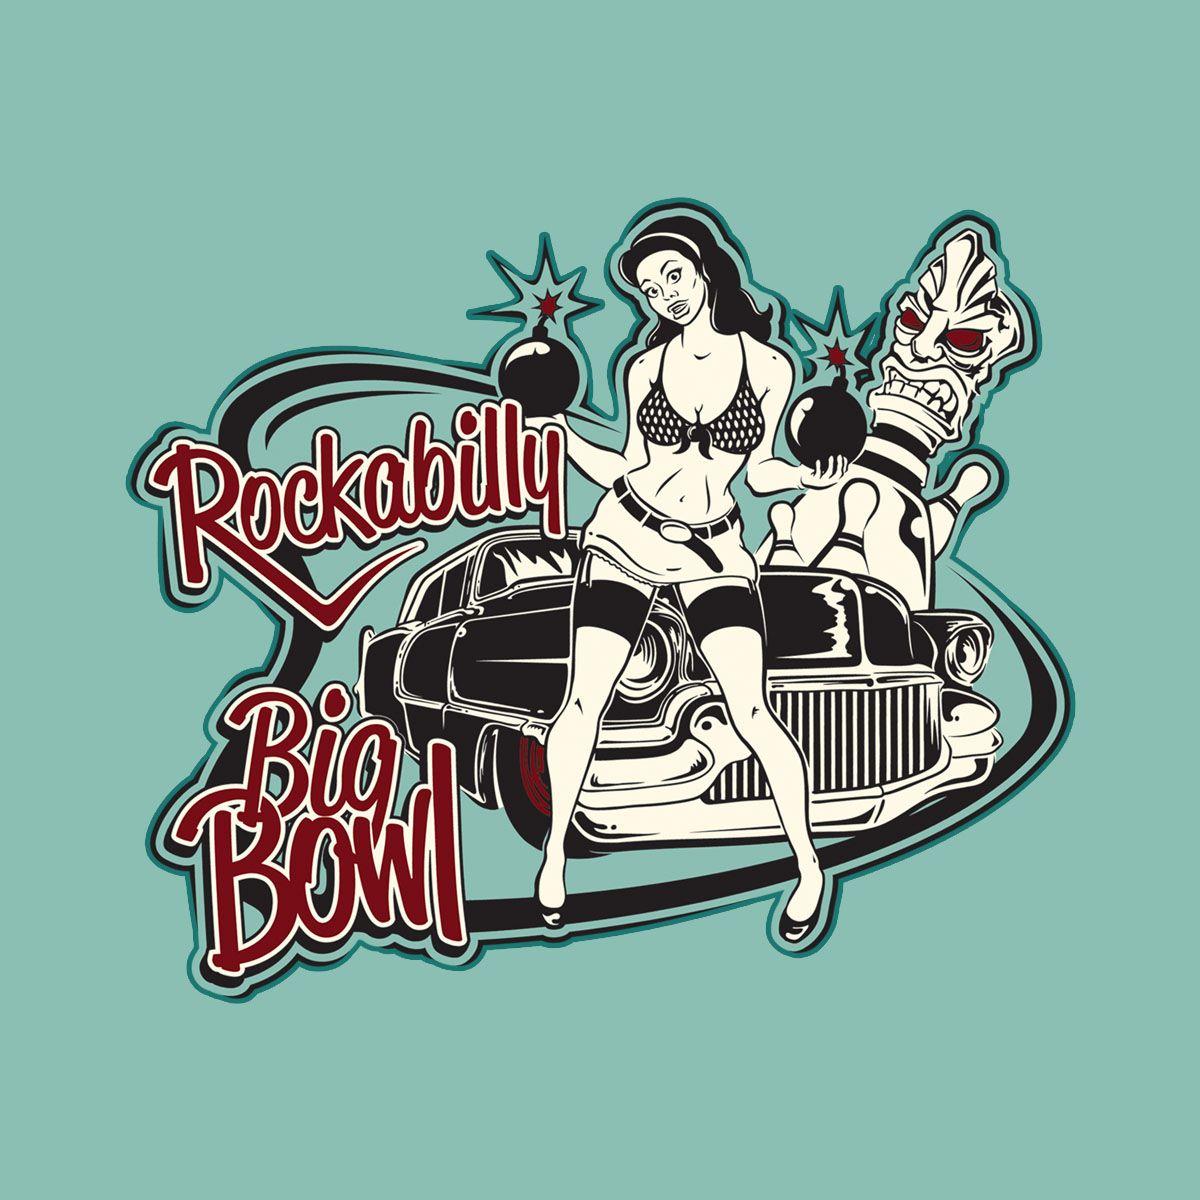 #Rockabilly #BigBowl